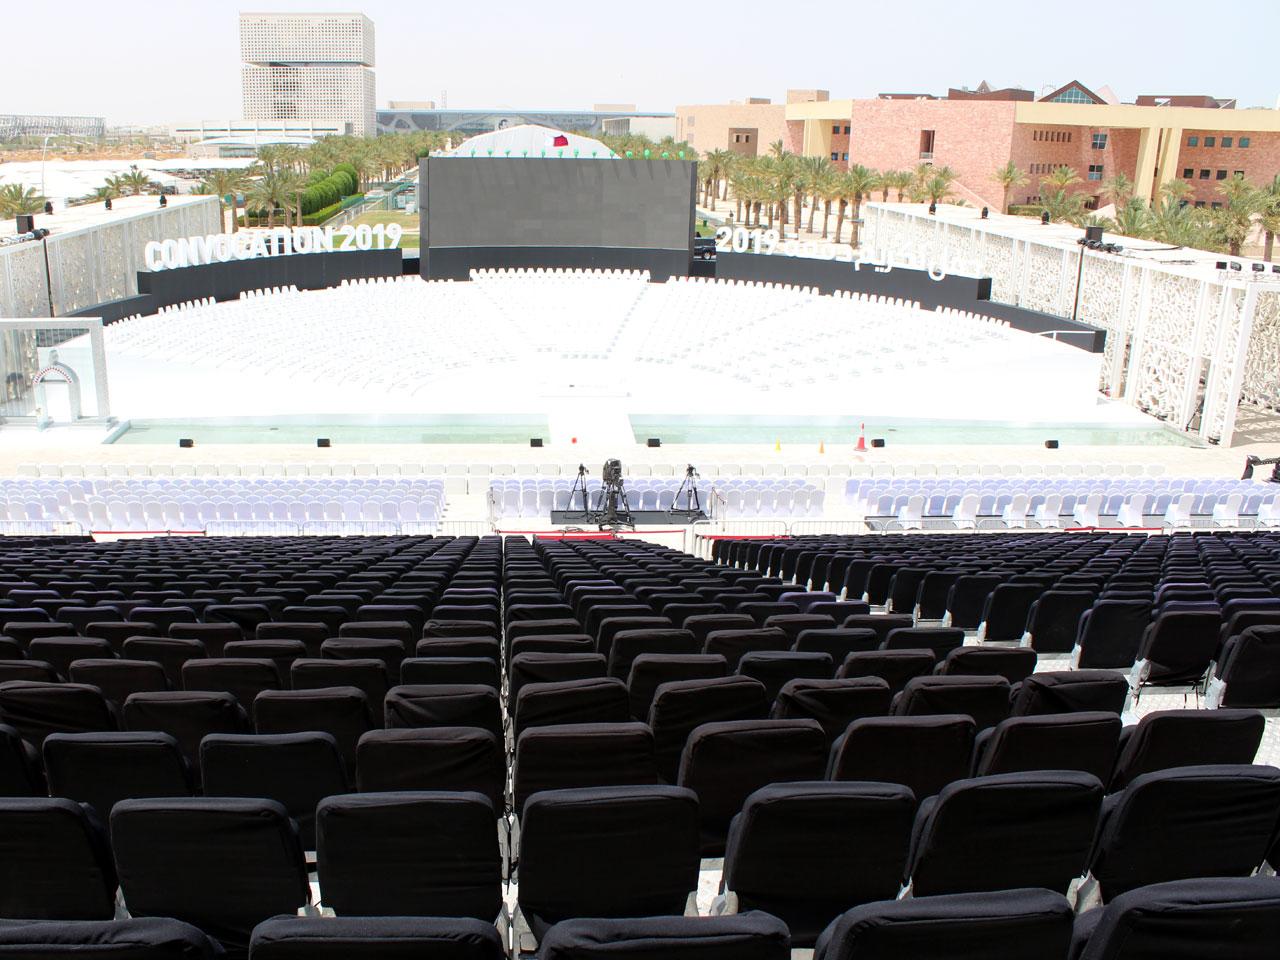 qatar-foundation-convocation-grandstands-2019-8